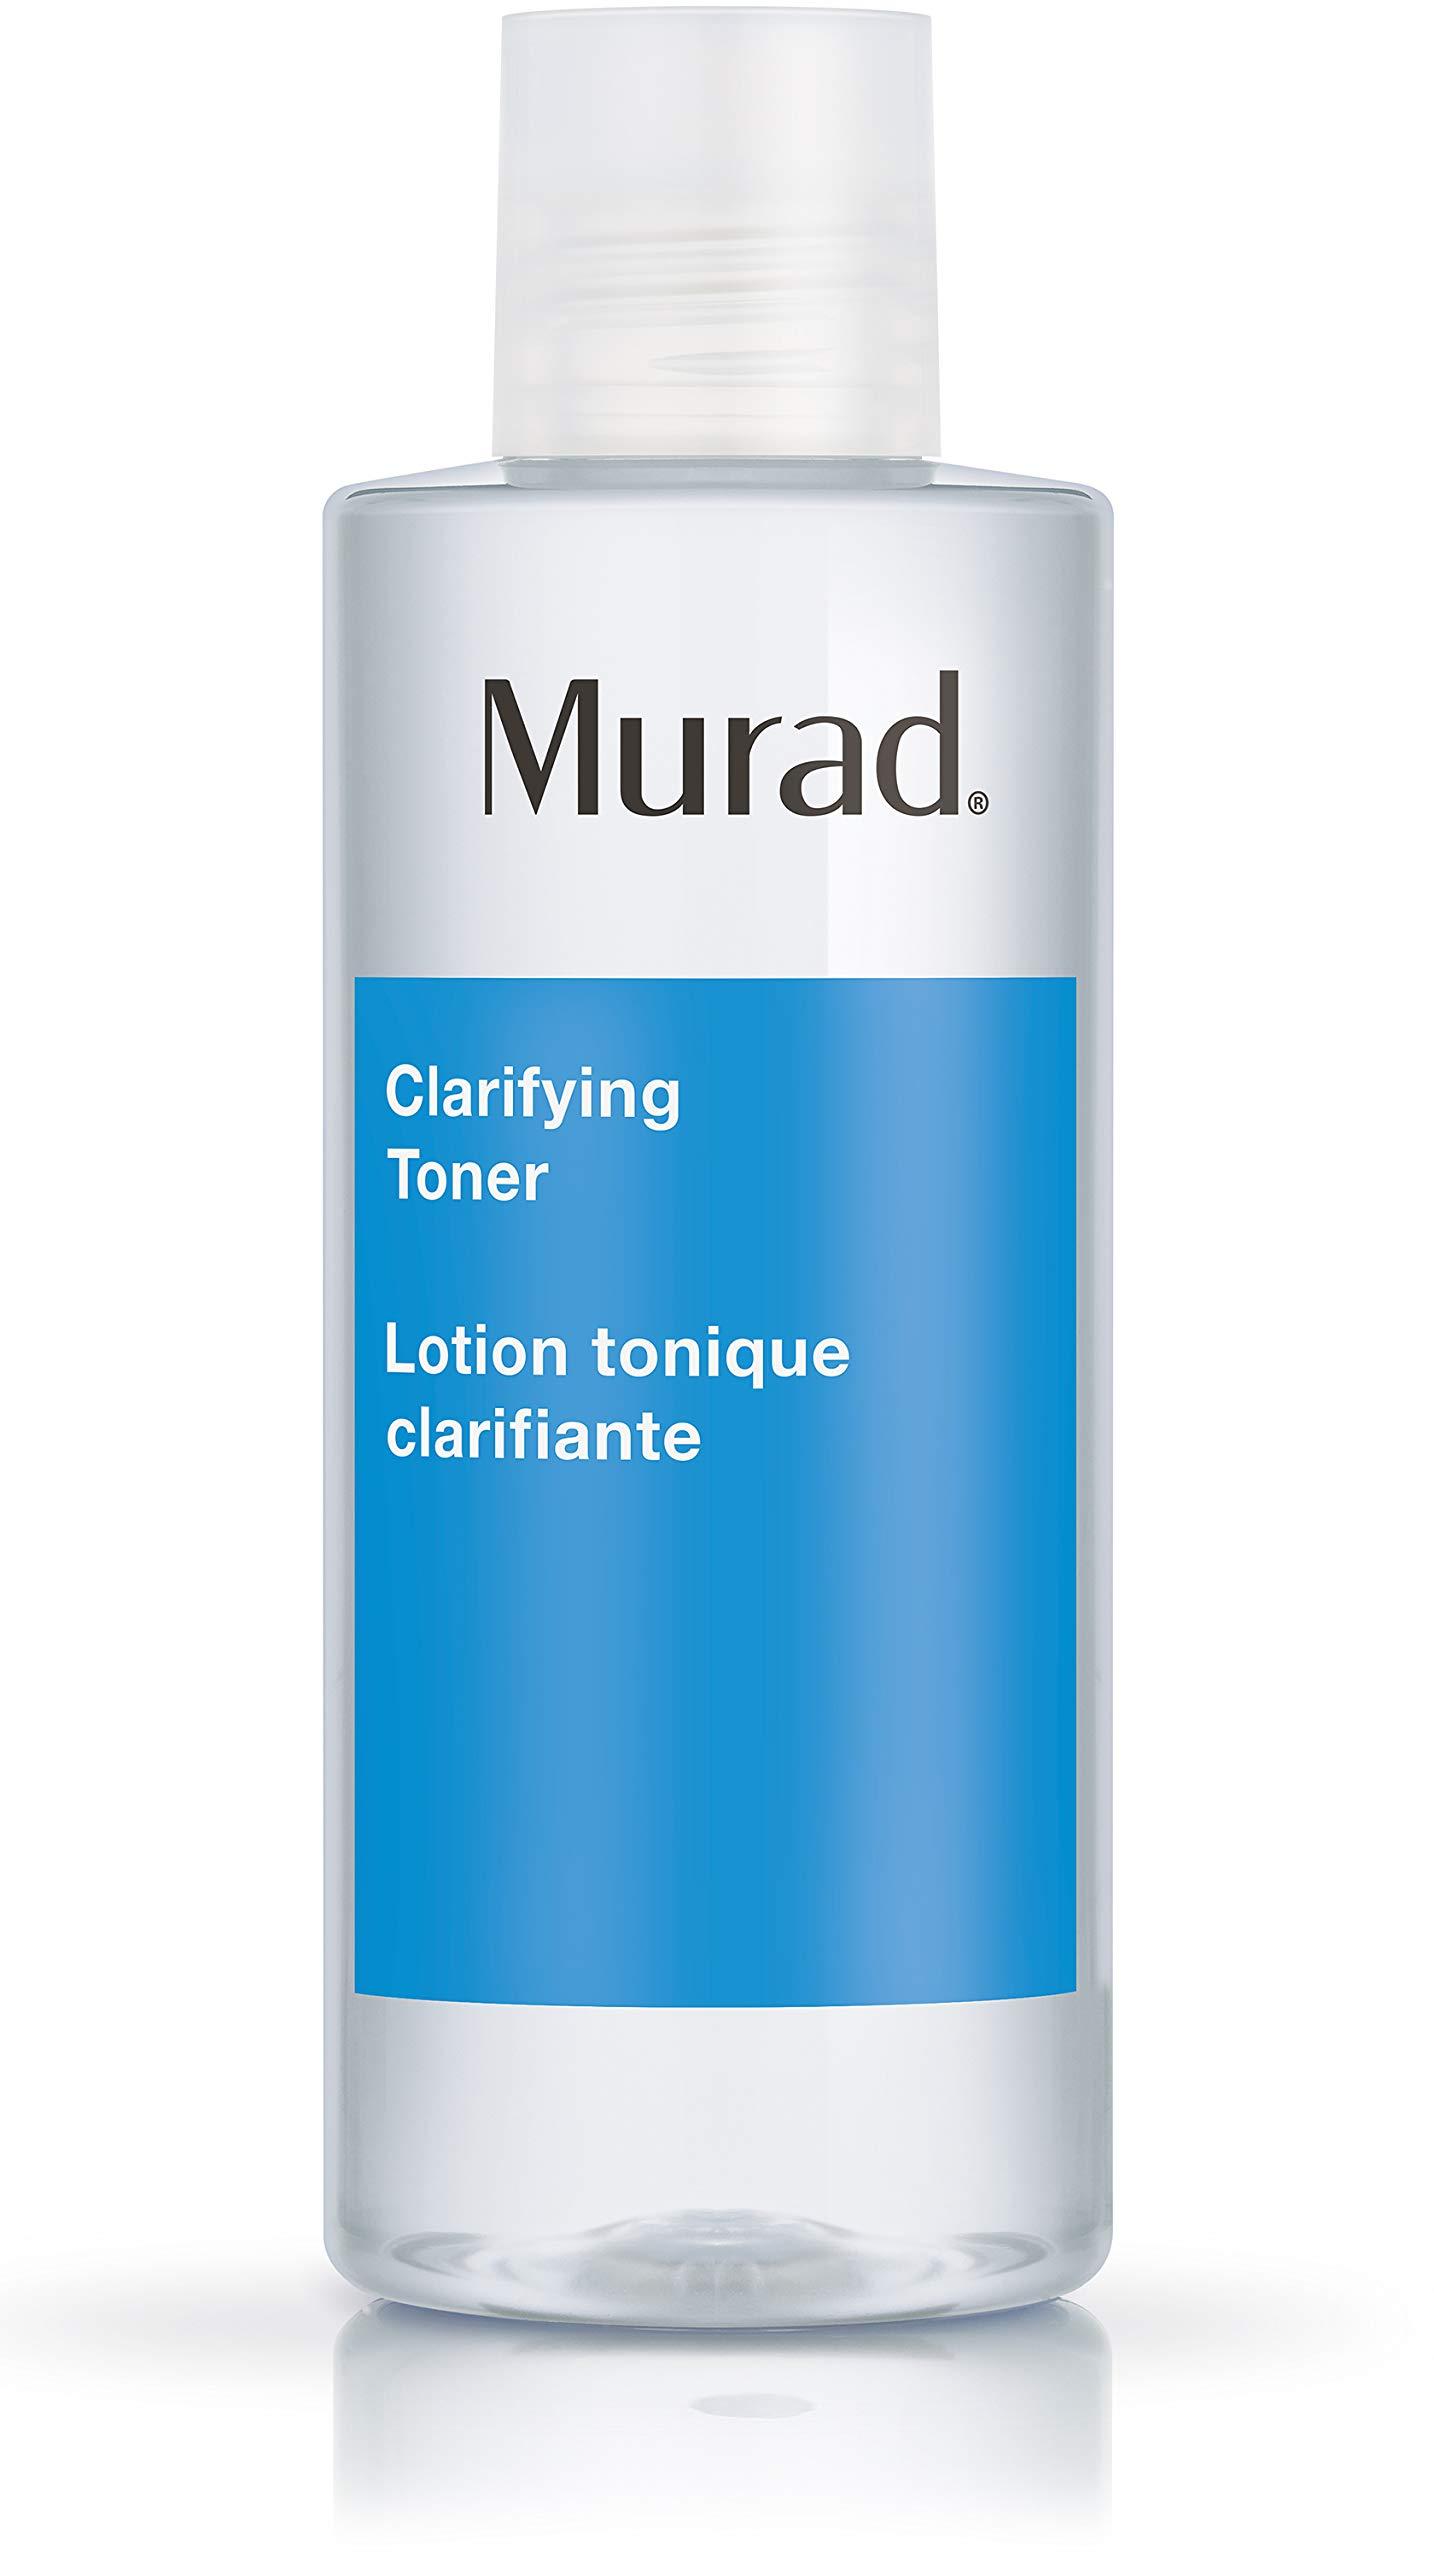 Murad Clarifying Toner, Step 1 Cleanse/Tone, 6 fl oz (180 ml) by Murad